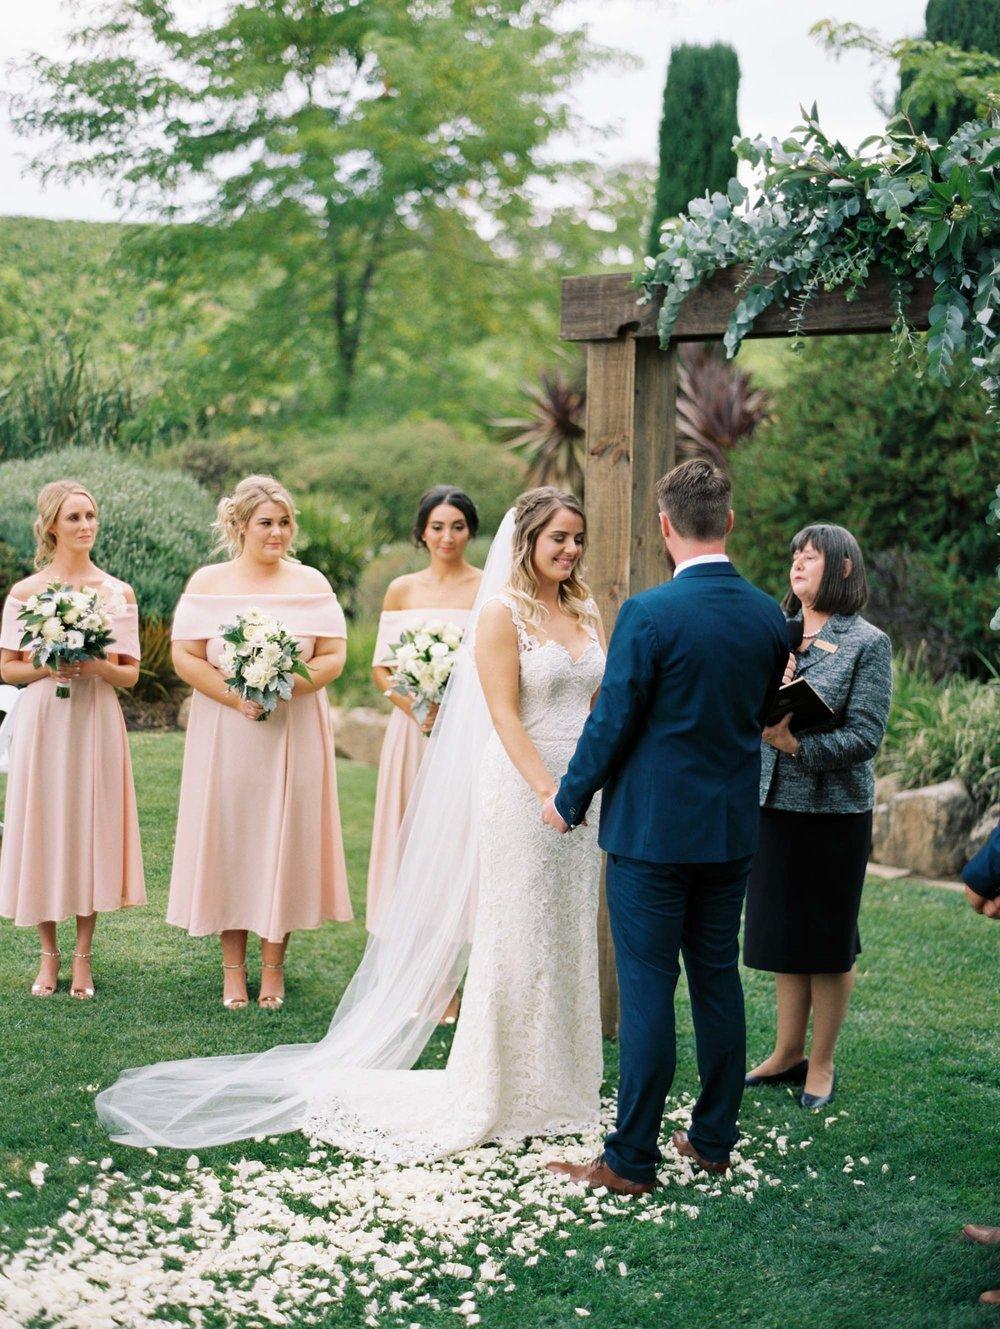 Golding-Wines-wedding-photography-052.jpg